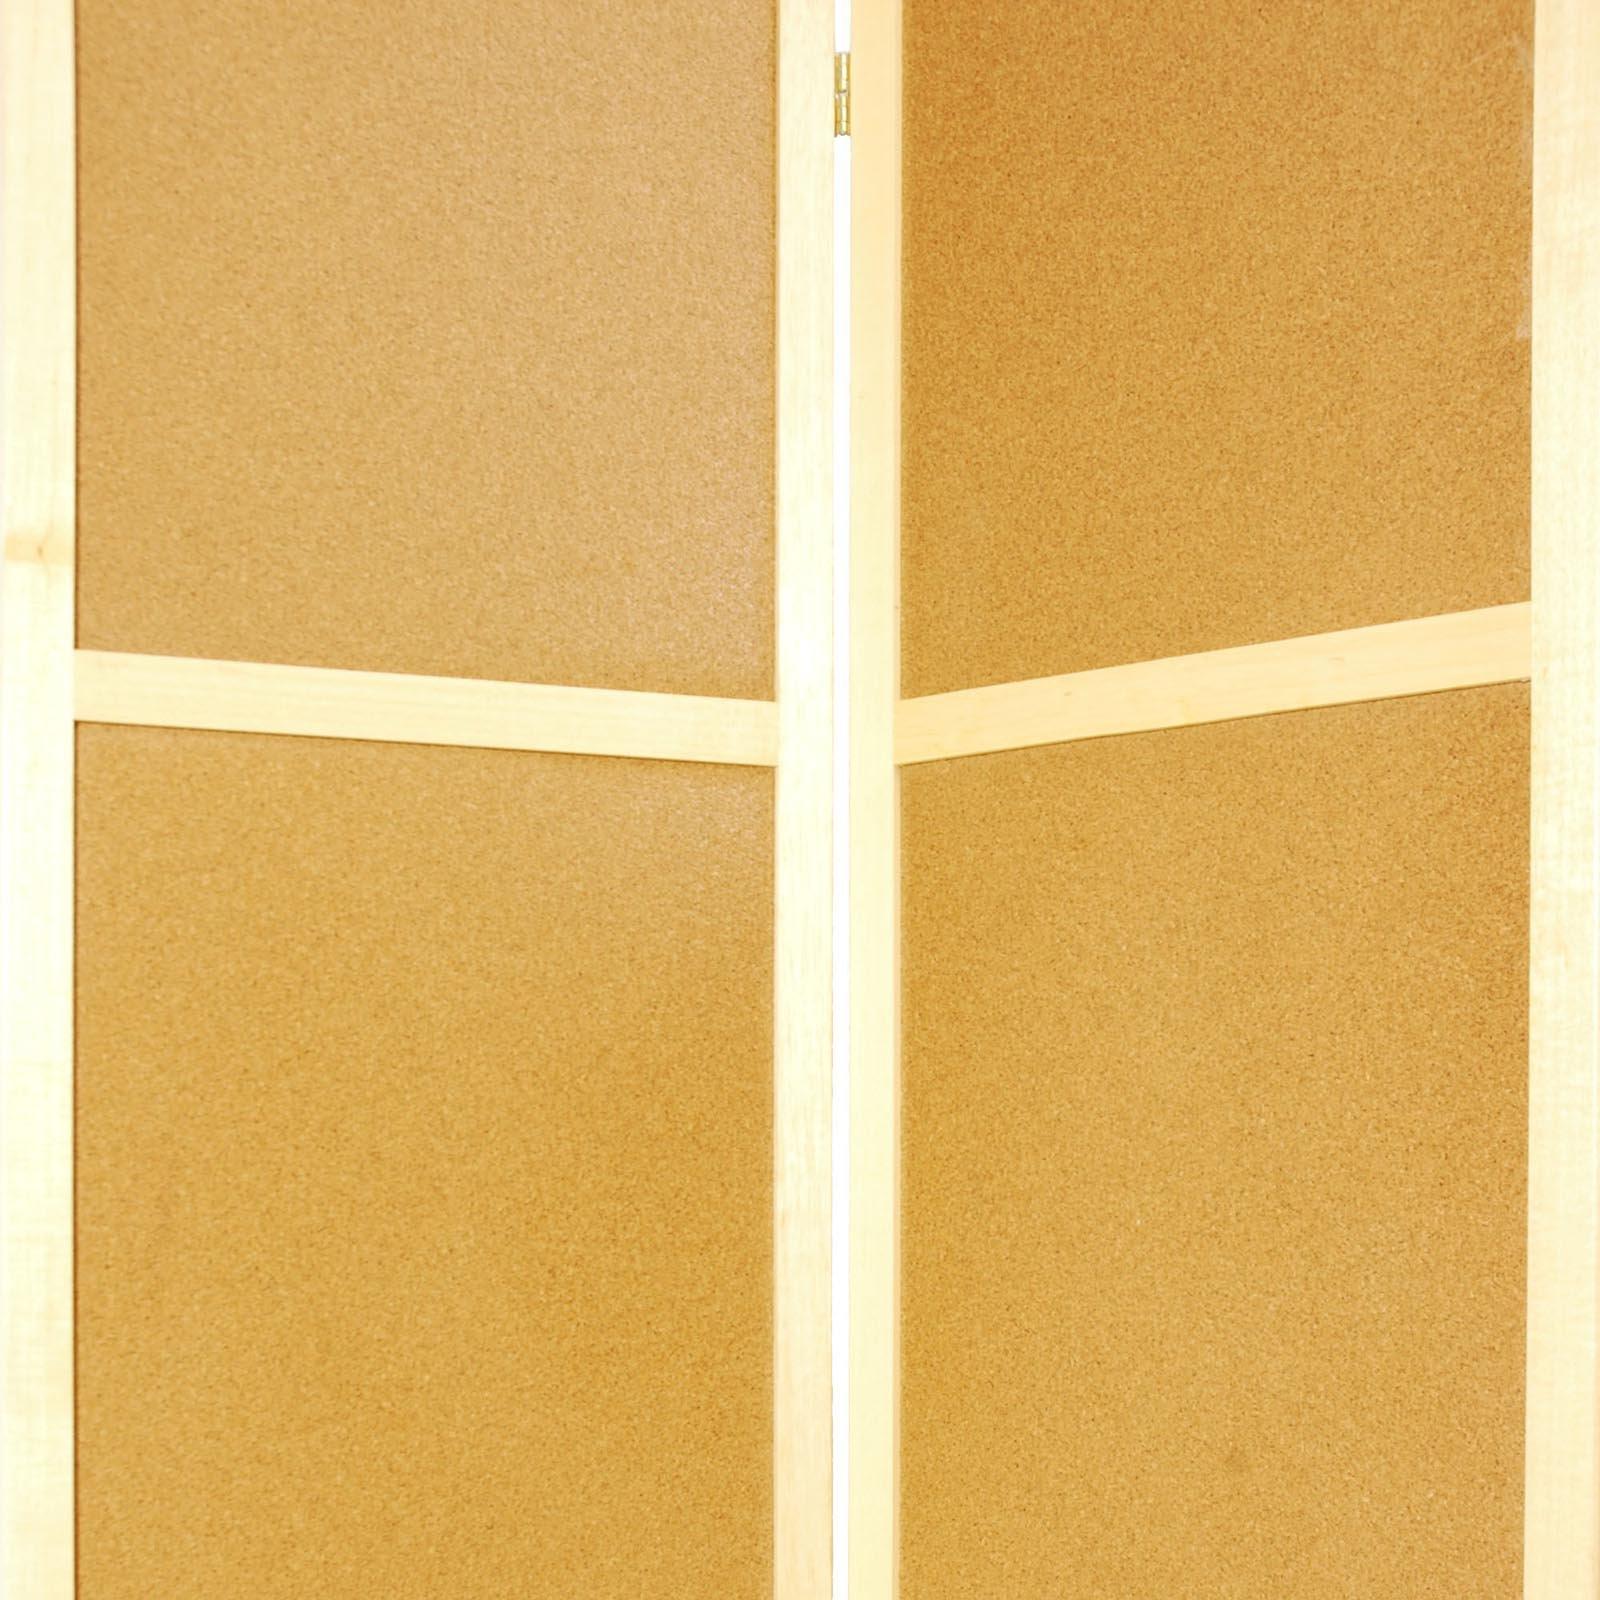 Oriental Furniture Cork Board Room Divider - Walmart.com